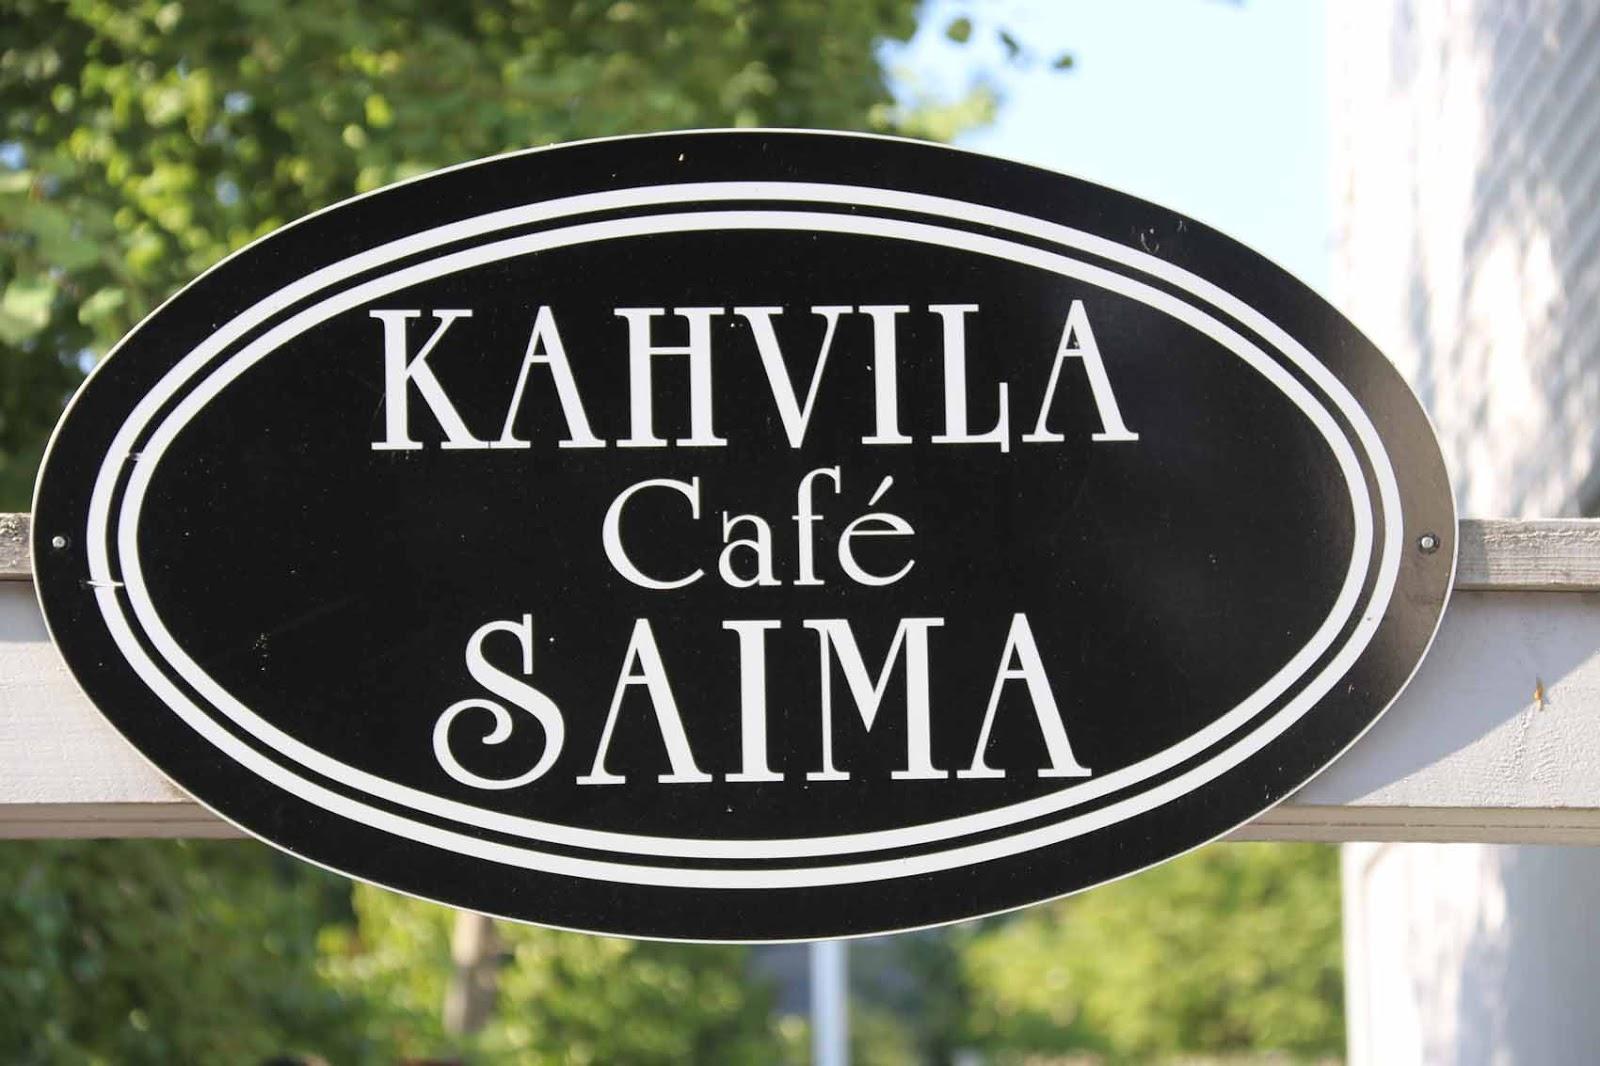 Cafe Saima